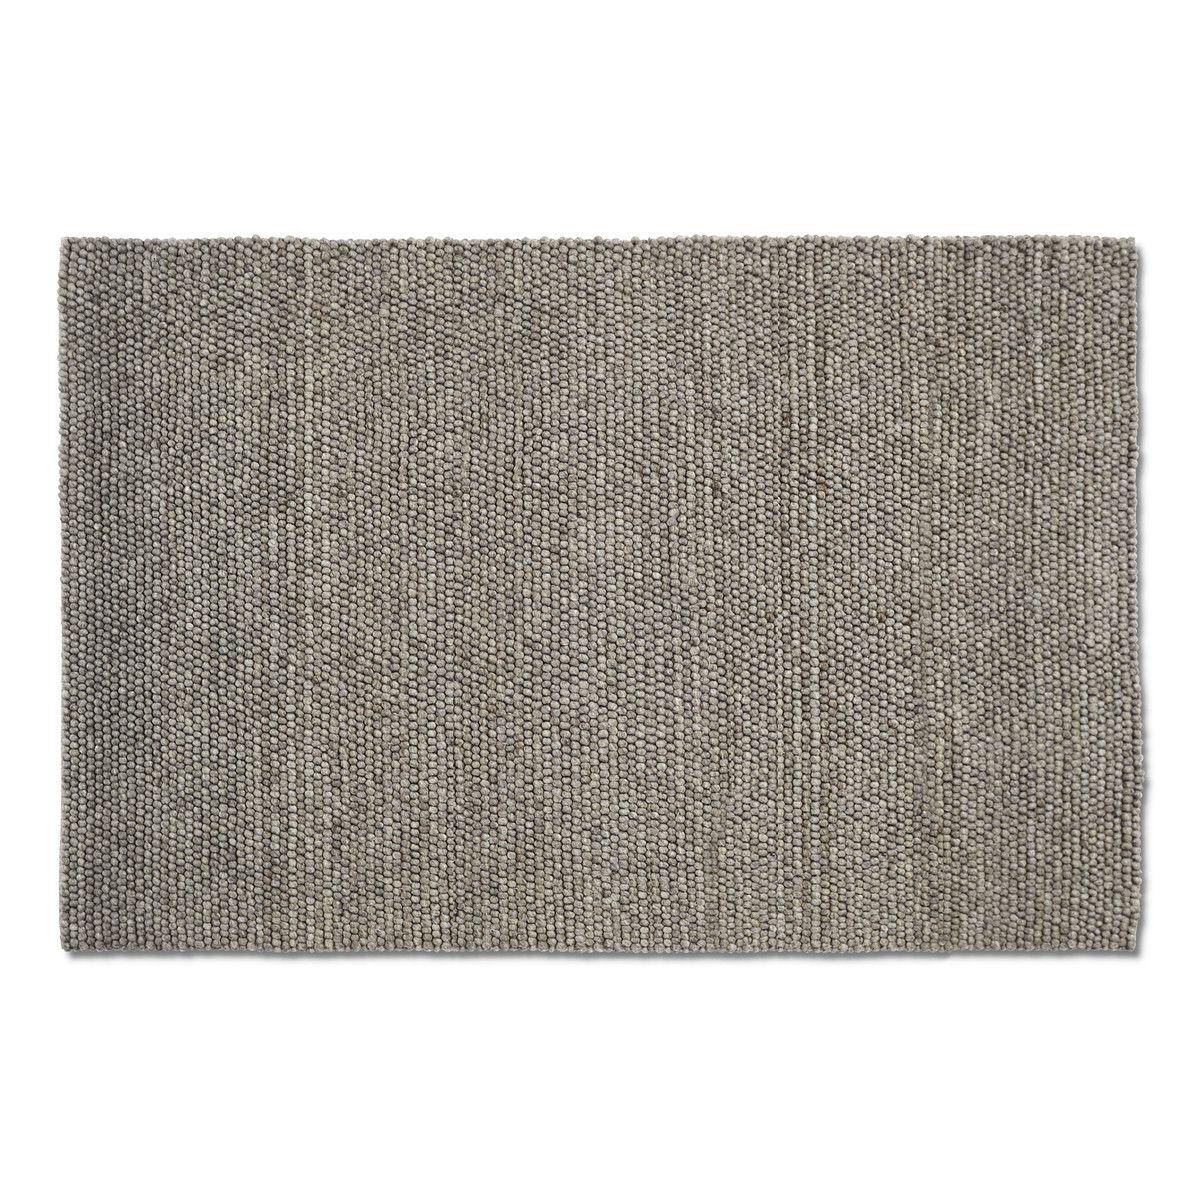 Hay Teppich hay peas carpet 140 x 200 cm medium grey house